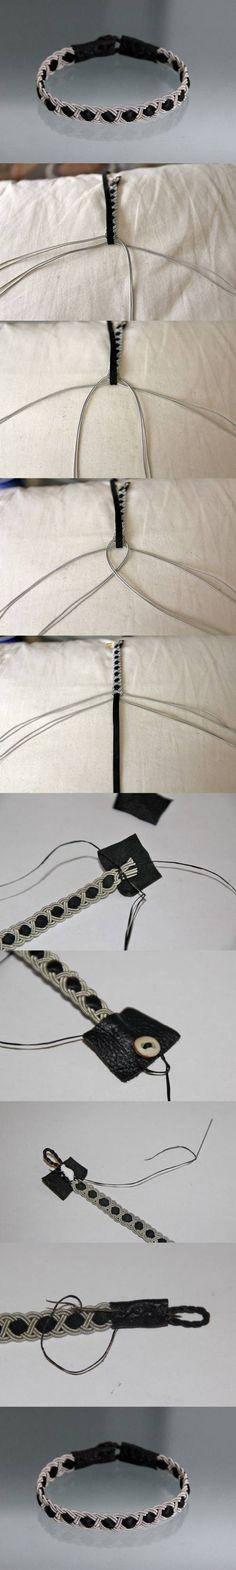 DIY Cute Rope Wristband by Bali